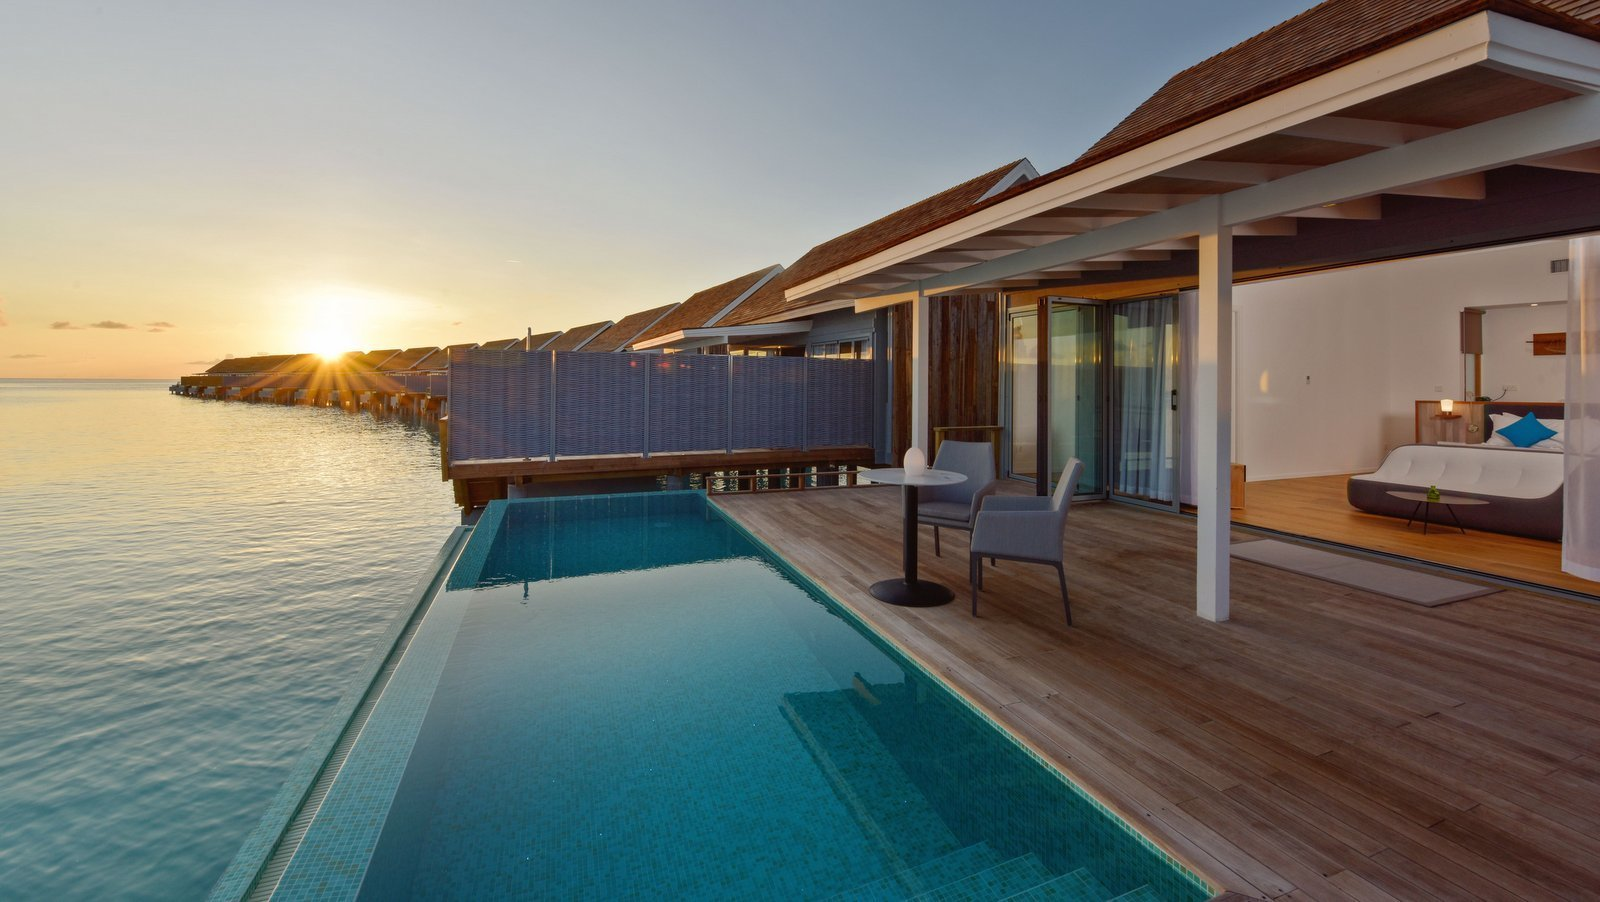 Мальдивы, отель Kuramathi Maldives, номер Thundi Water Villa with Pool